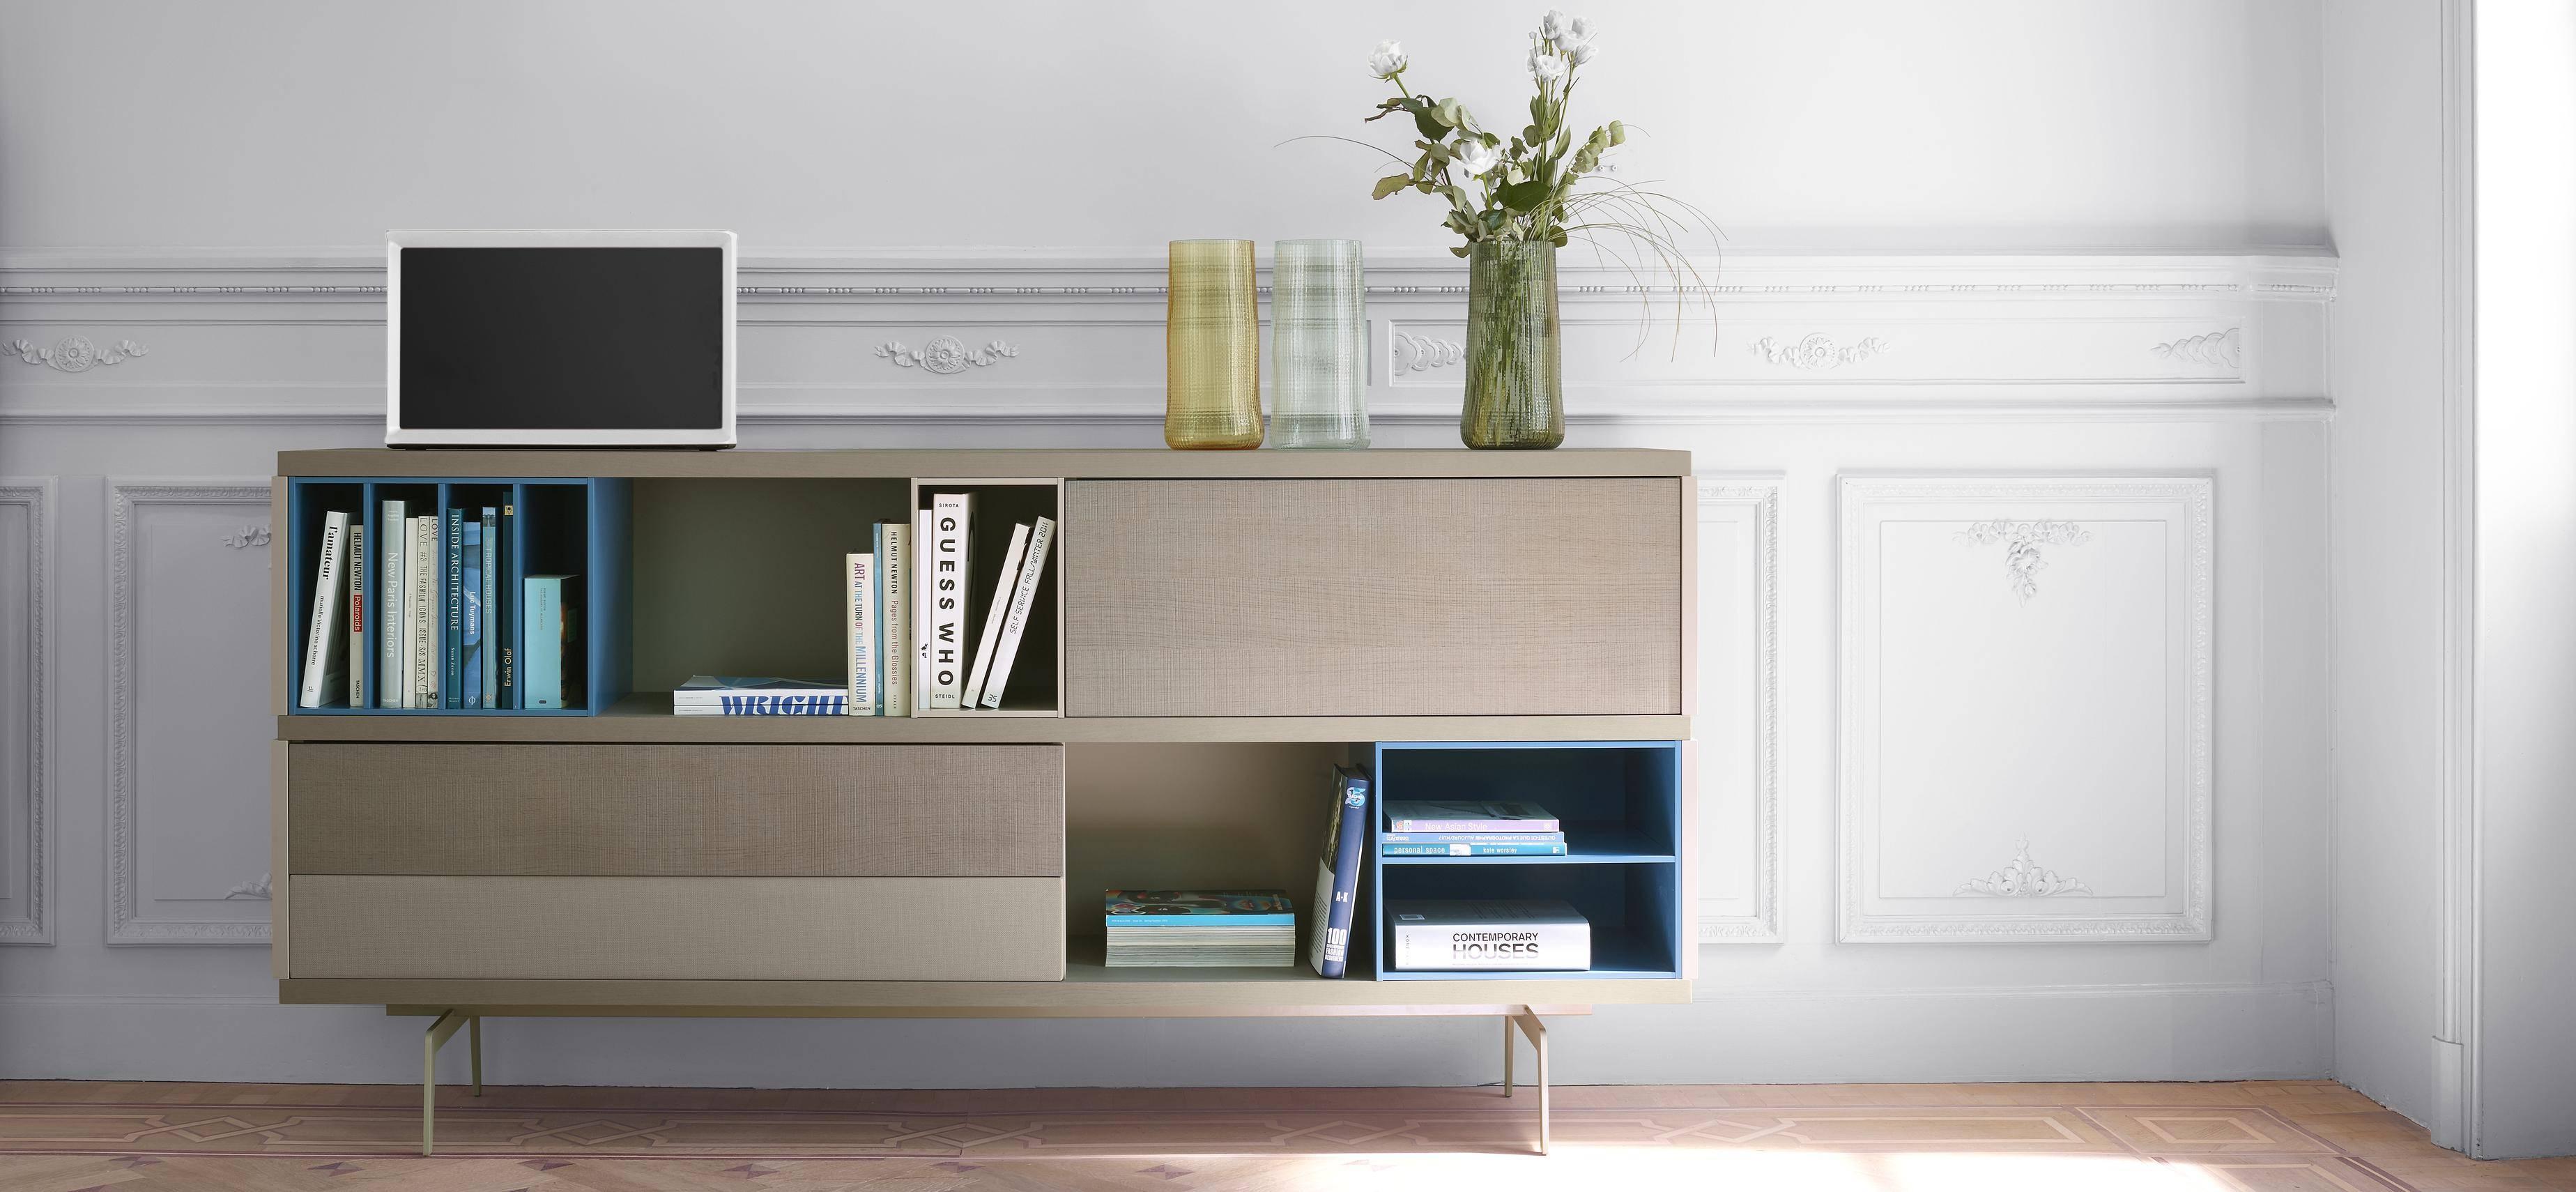 Mixte Living Room, Sideboards Designer : Mauro Lipparini   Ligne Roset Within Sideboard For Living Room (#14 of 20)